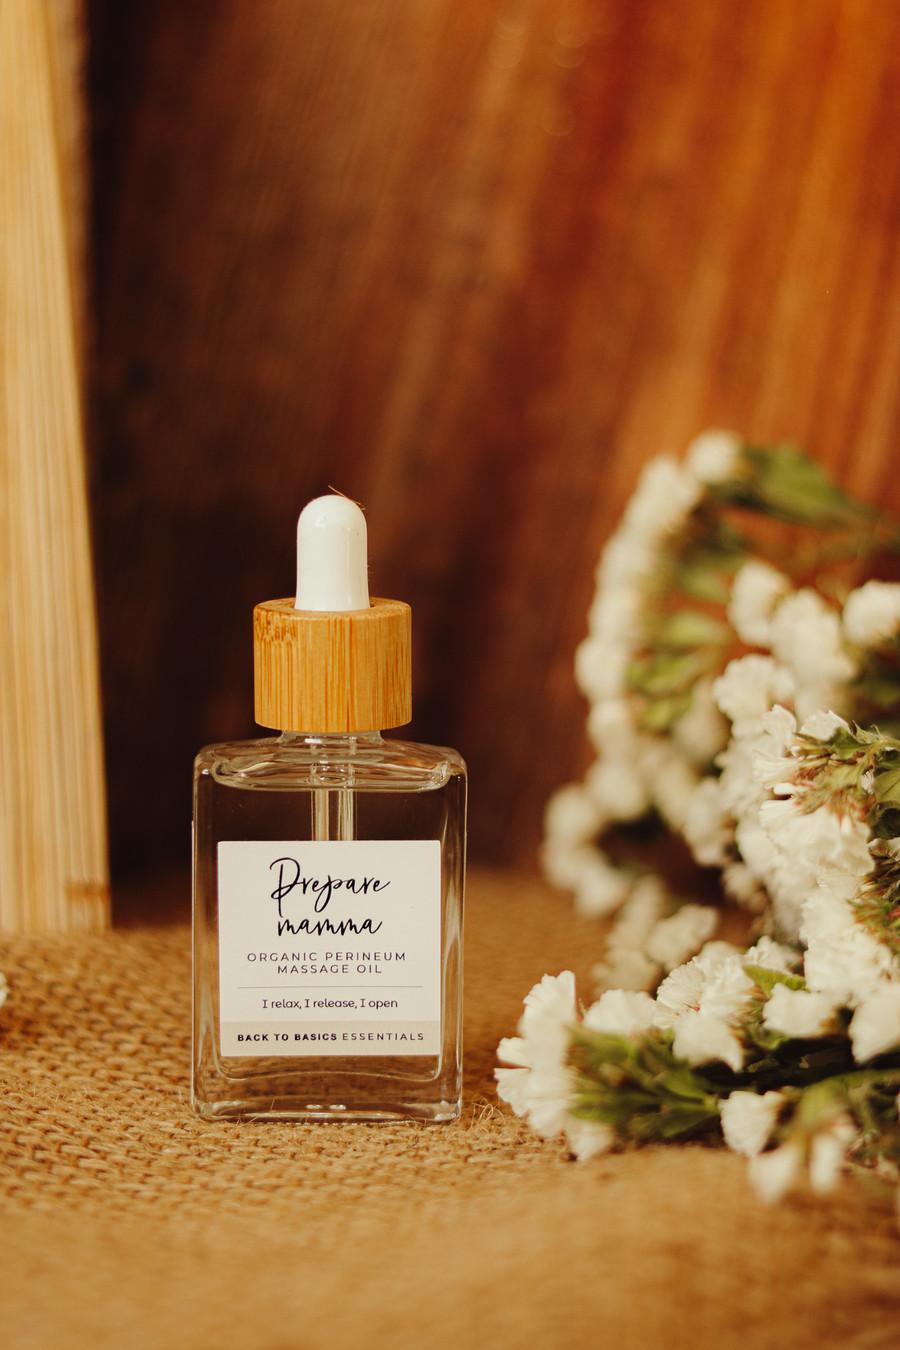 Prepare Mamma-Organic Perineum Massage Oil